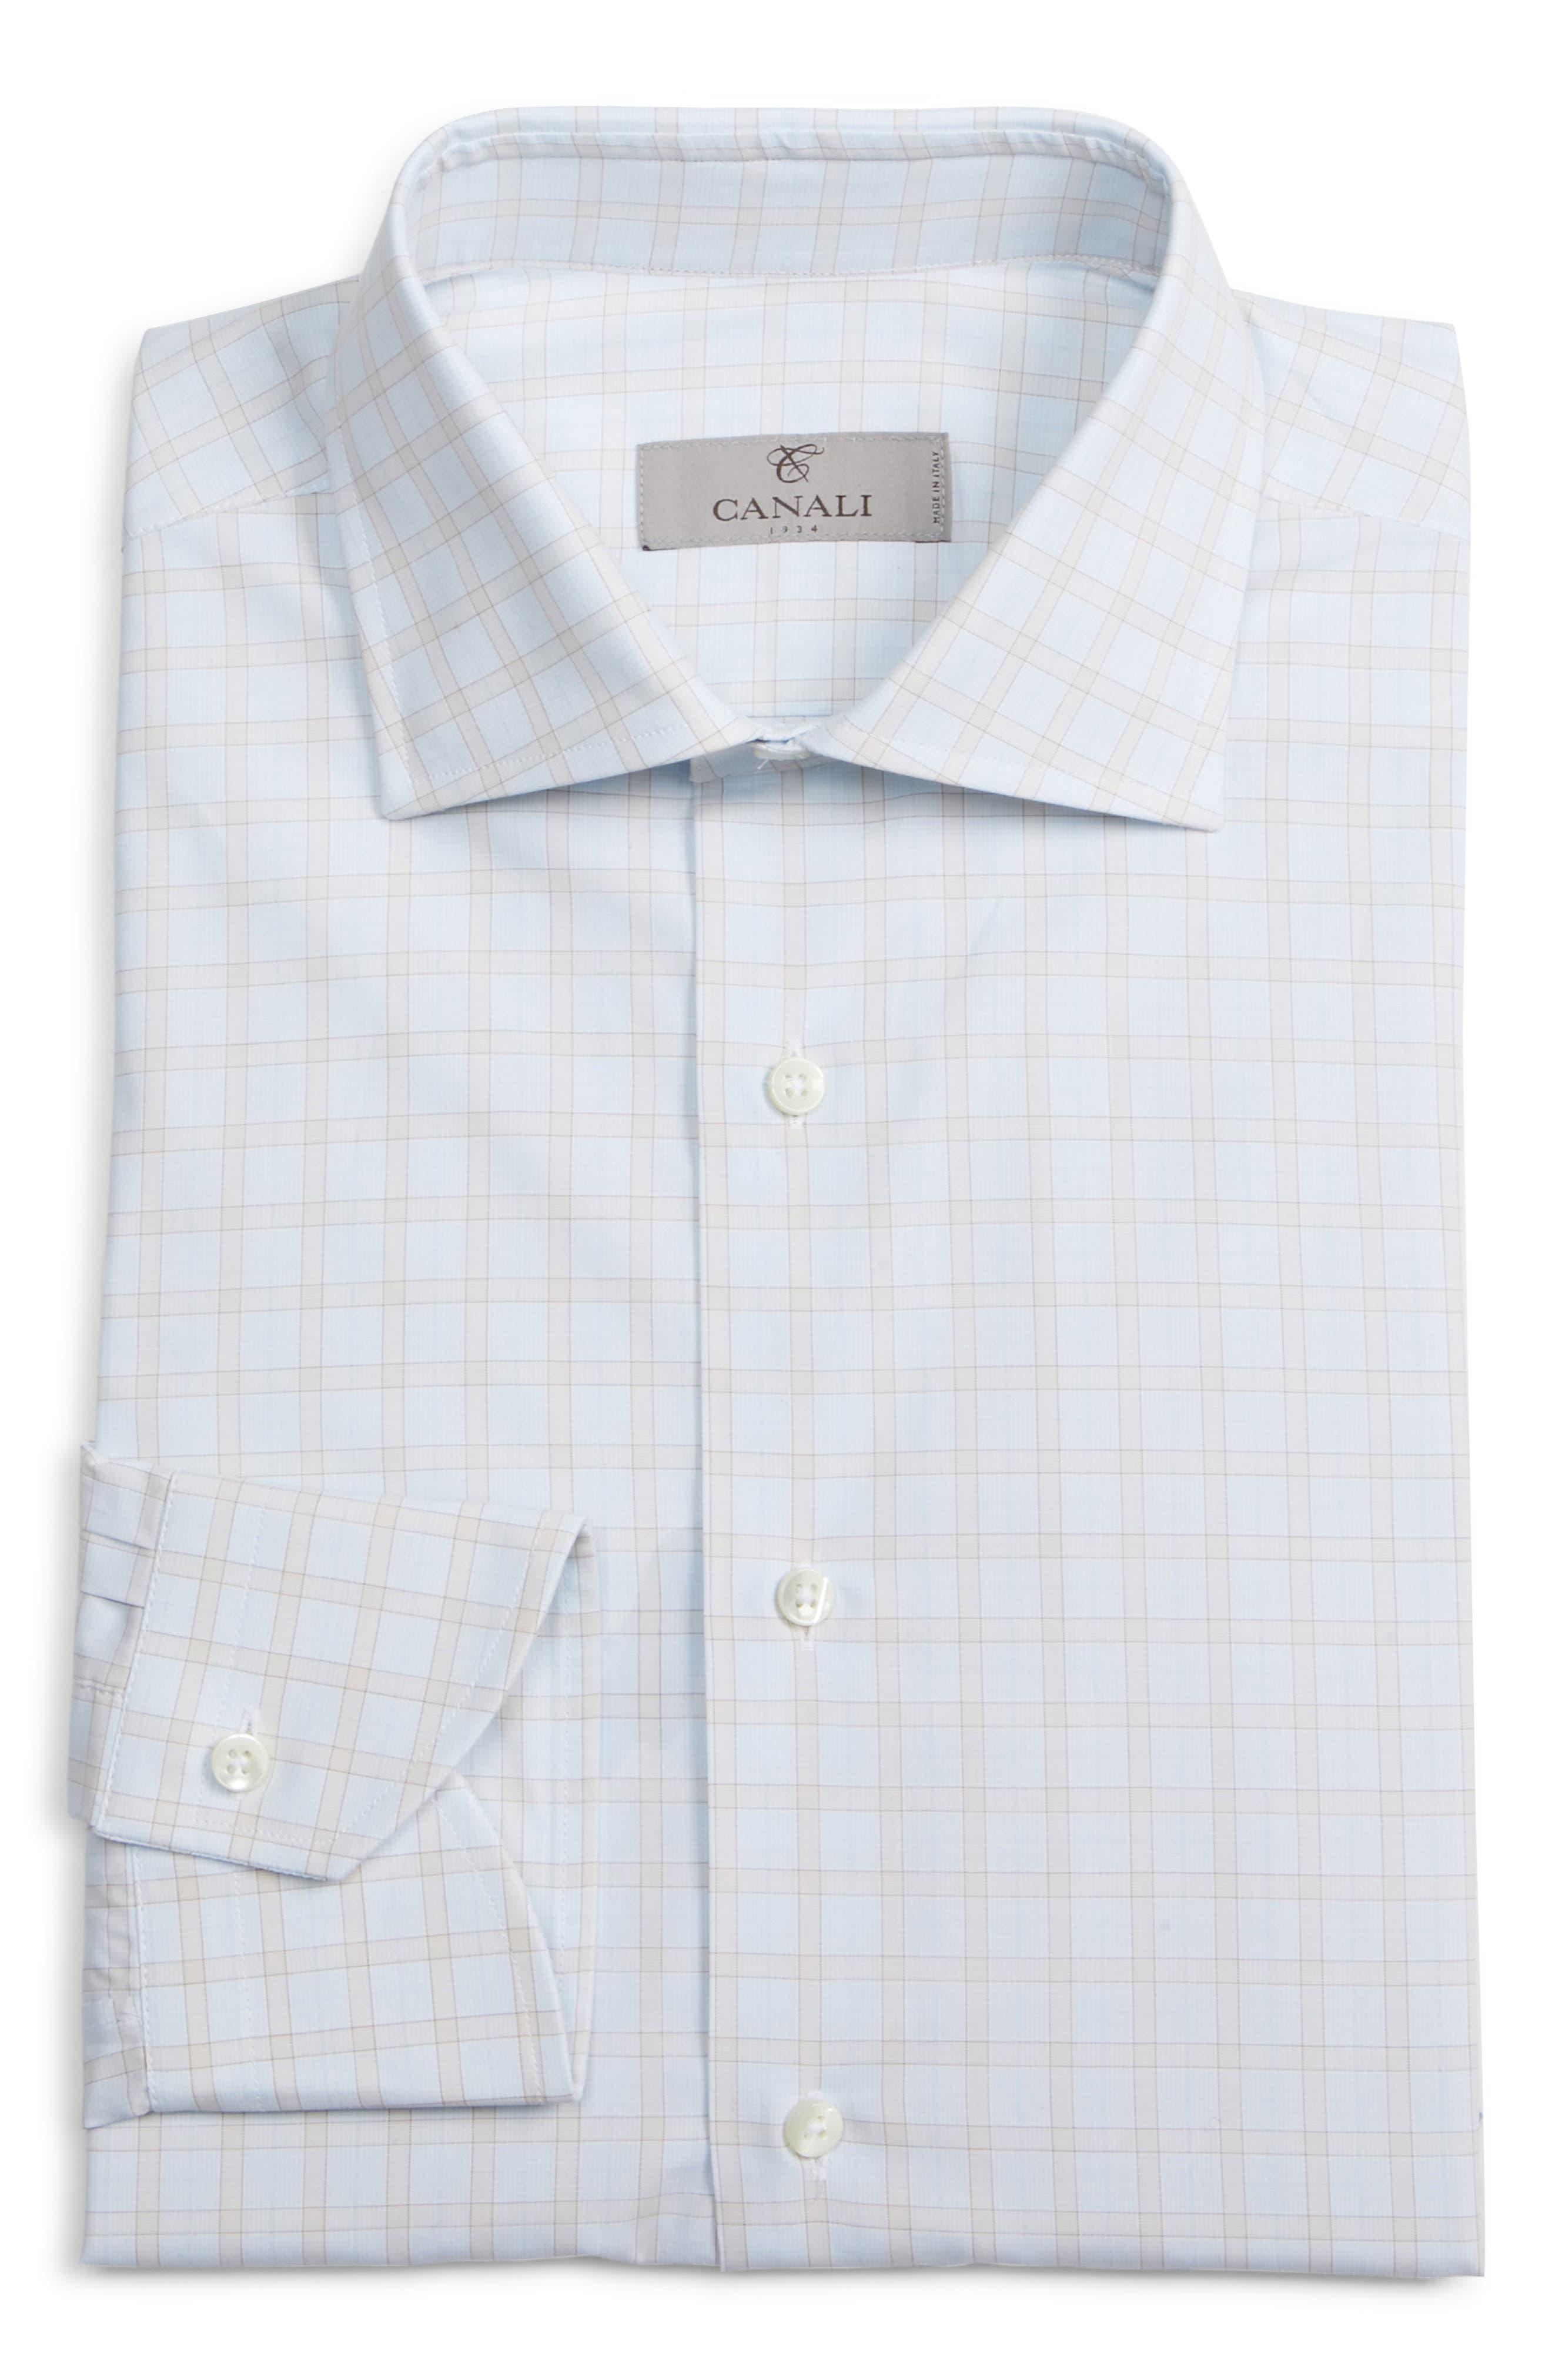 CANALI, Regular Fit Plaid Dress Shirt, Alternate thumbnail 5, color, BEIGE